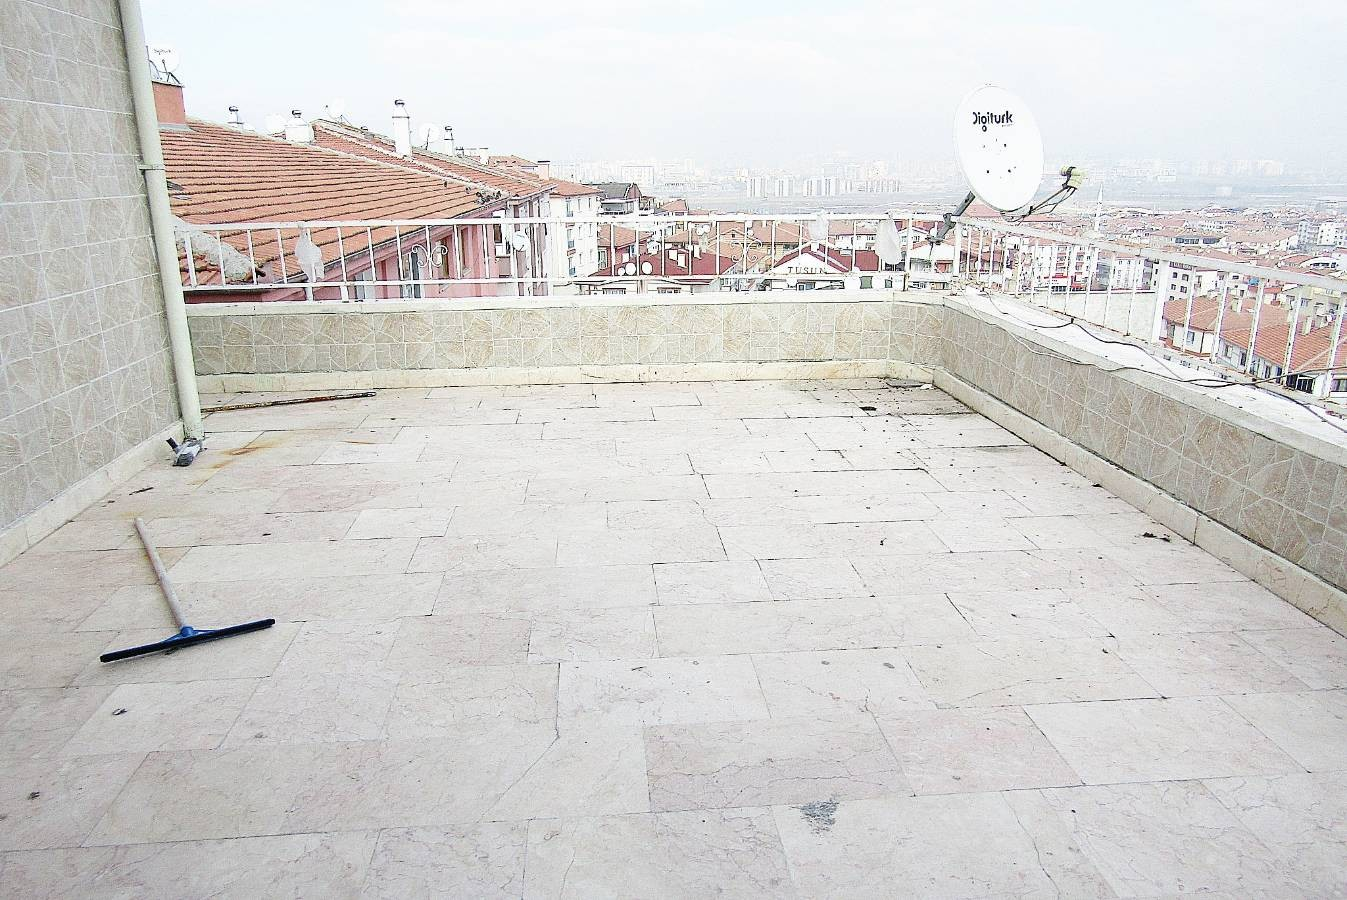 SR EMLAK'TAN PİYADE MAH'DE 6+1 220m² CADDE ÜZERİNDE MANZARALI TERAS